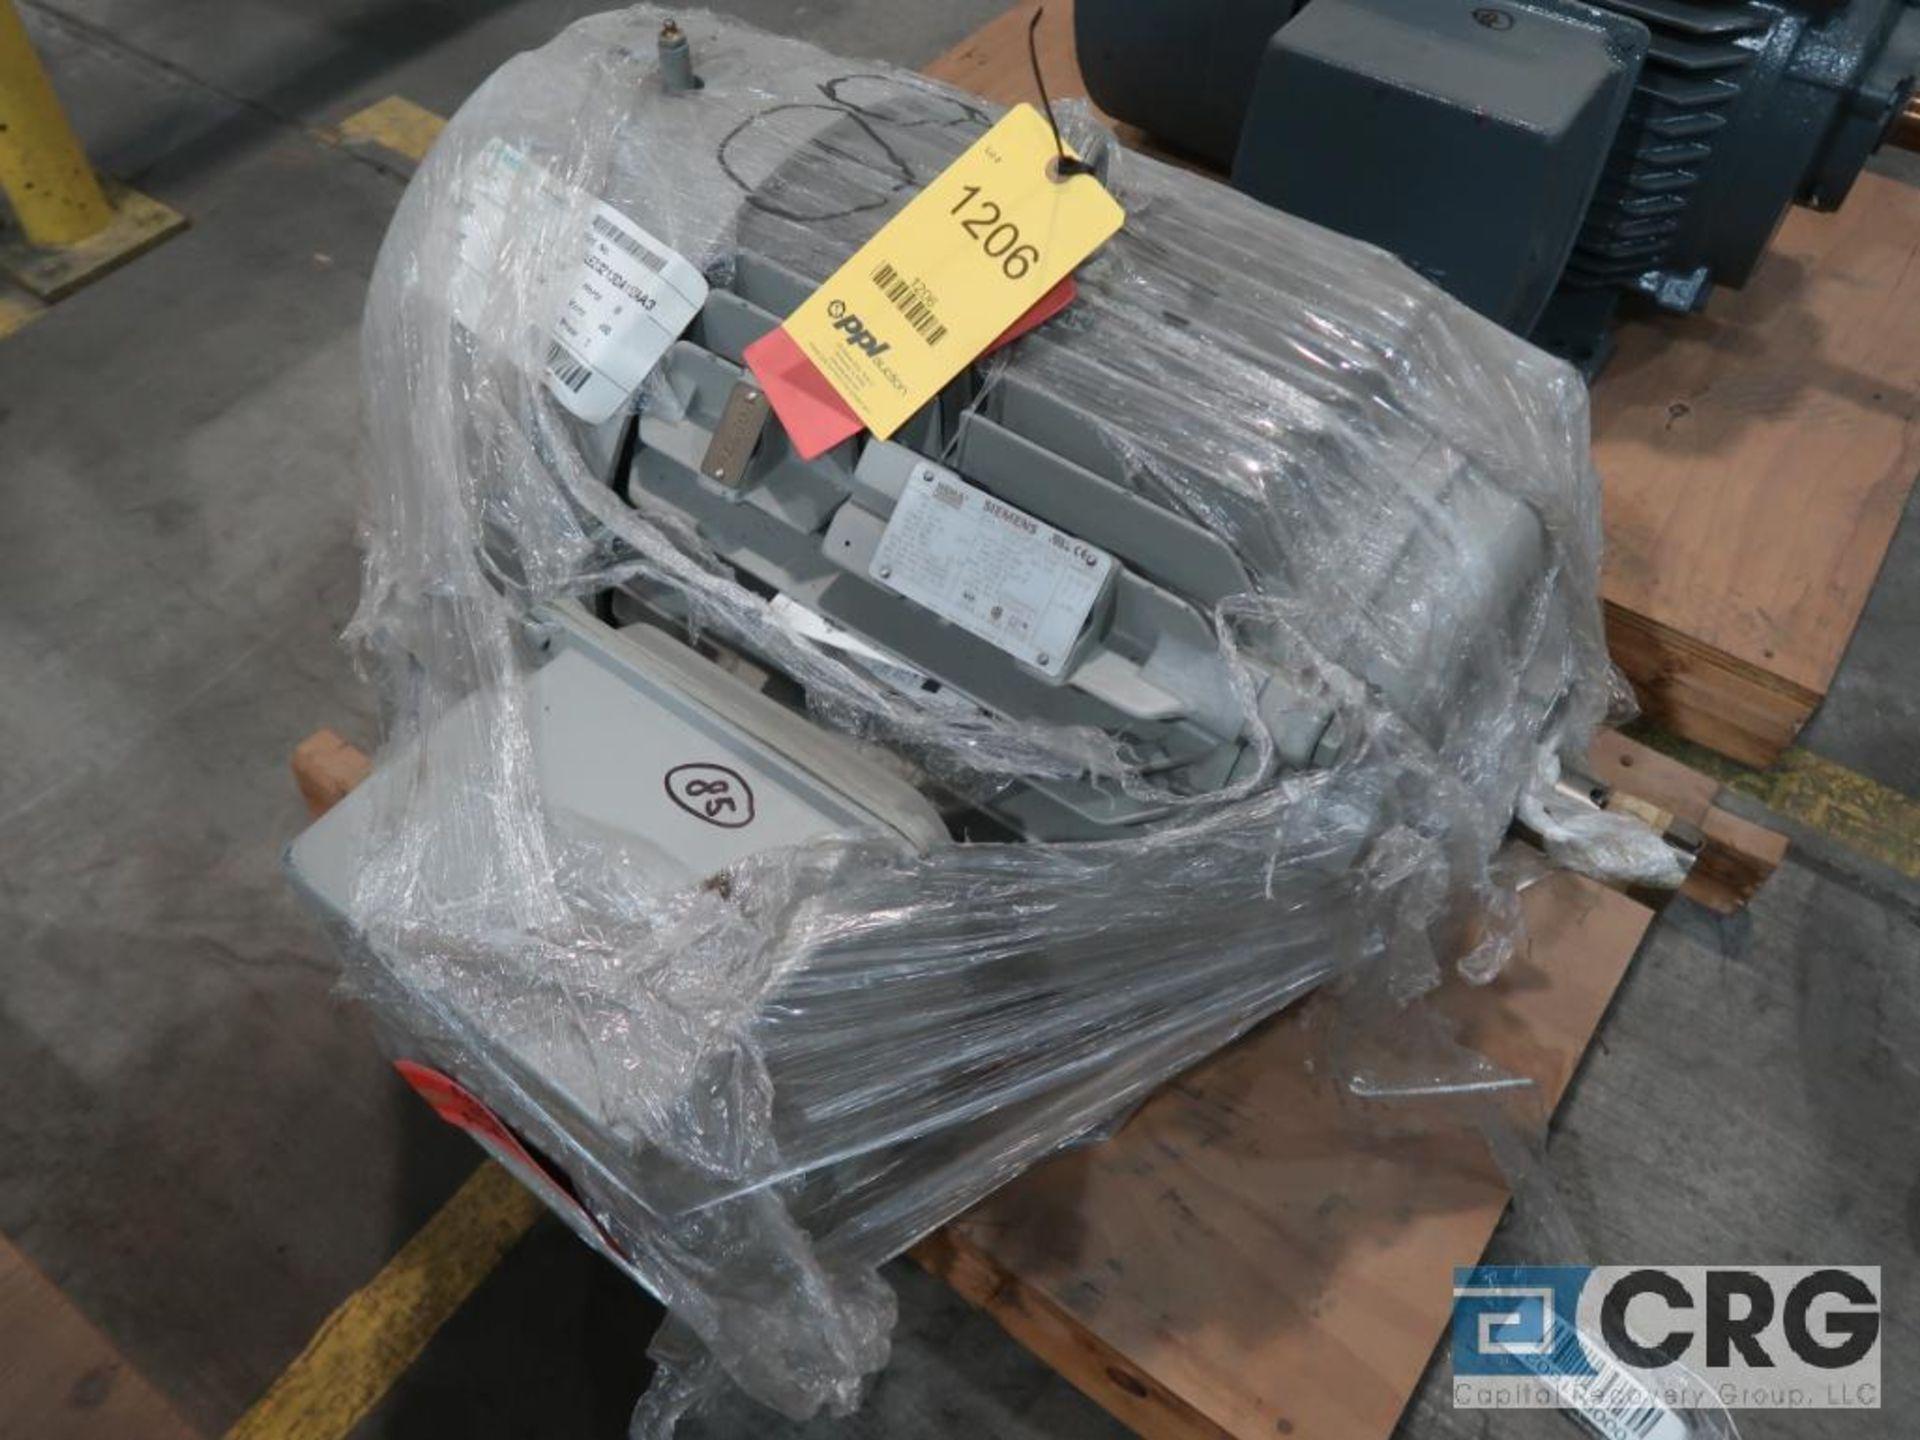 Siemens NEMA Premium Efficiency motor, 60 HP, 3,565 RPMs, 460 volt, 3 ph., 364TS frame (Finish